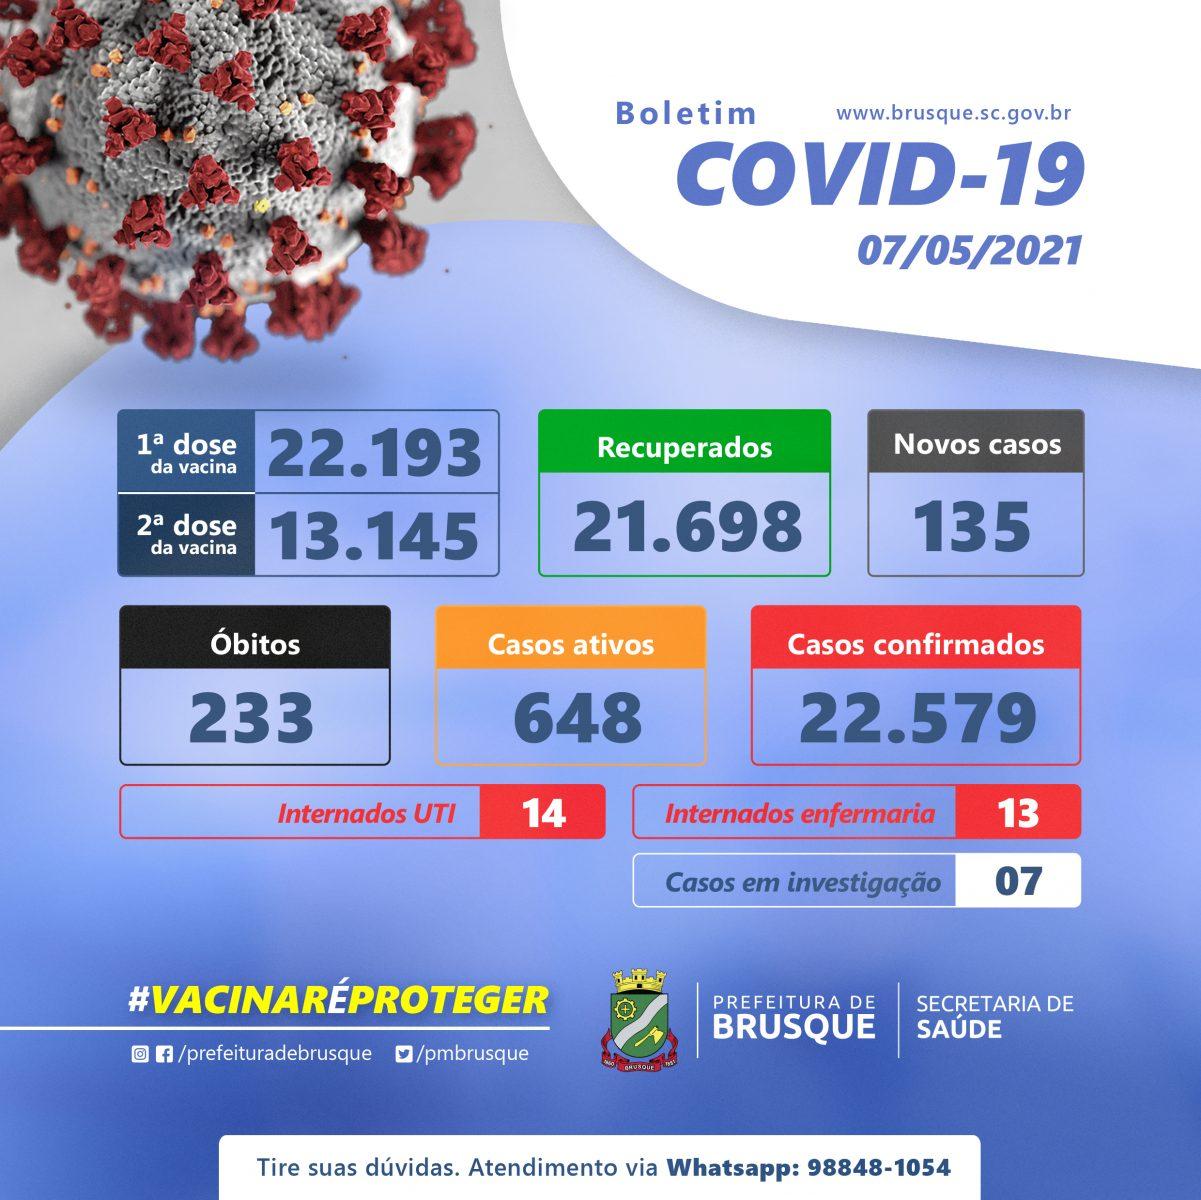 Covid 19: Confira o boletim epidemiológico desta sexta-feira (07)